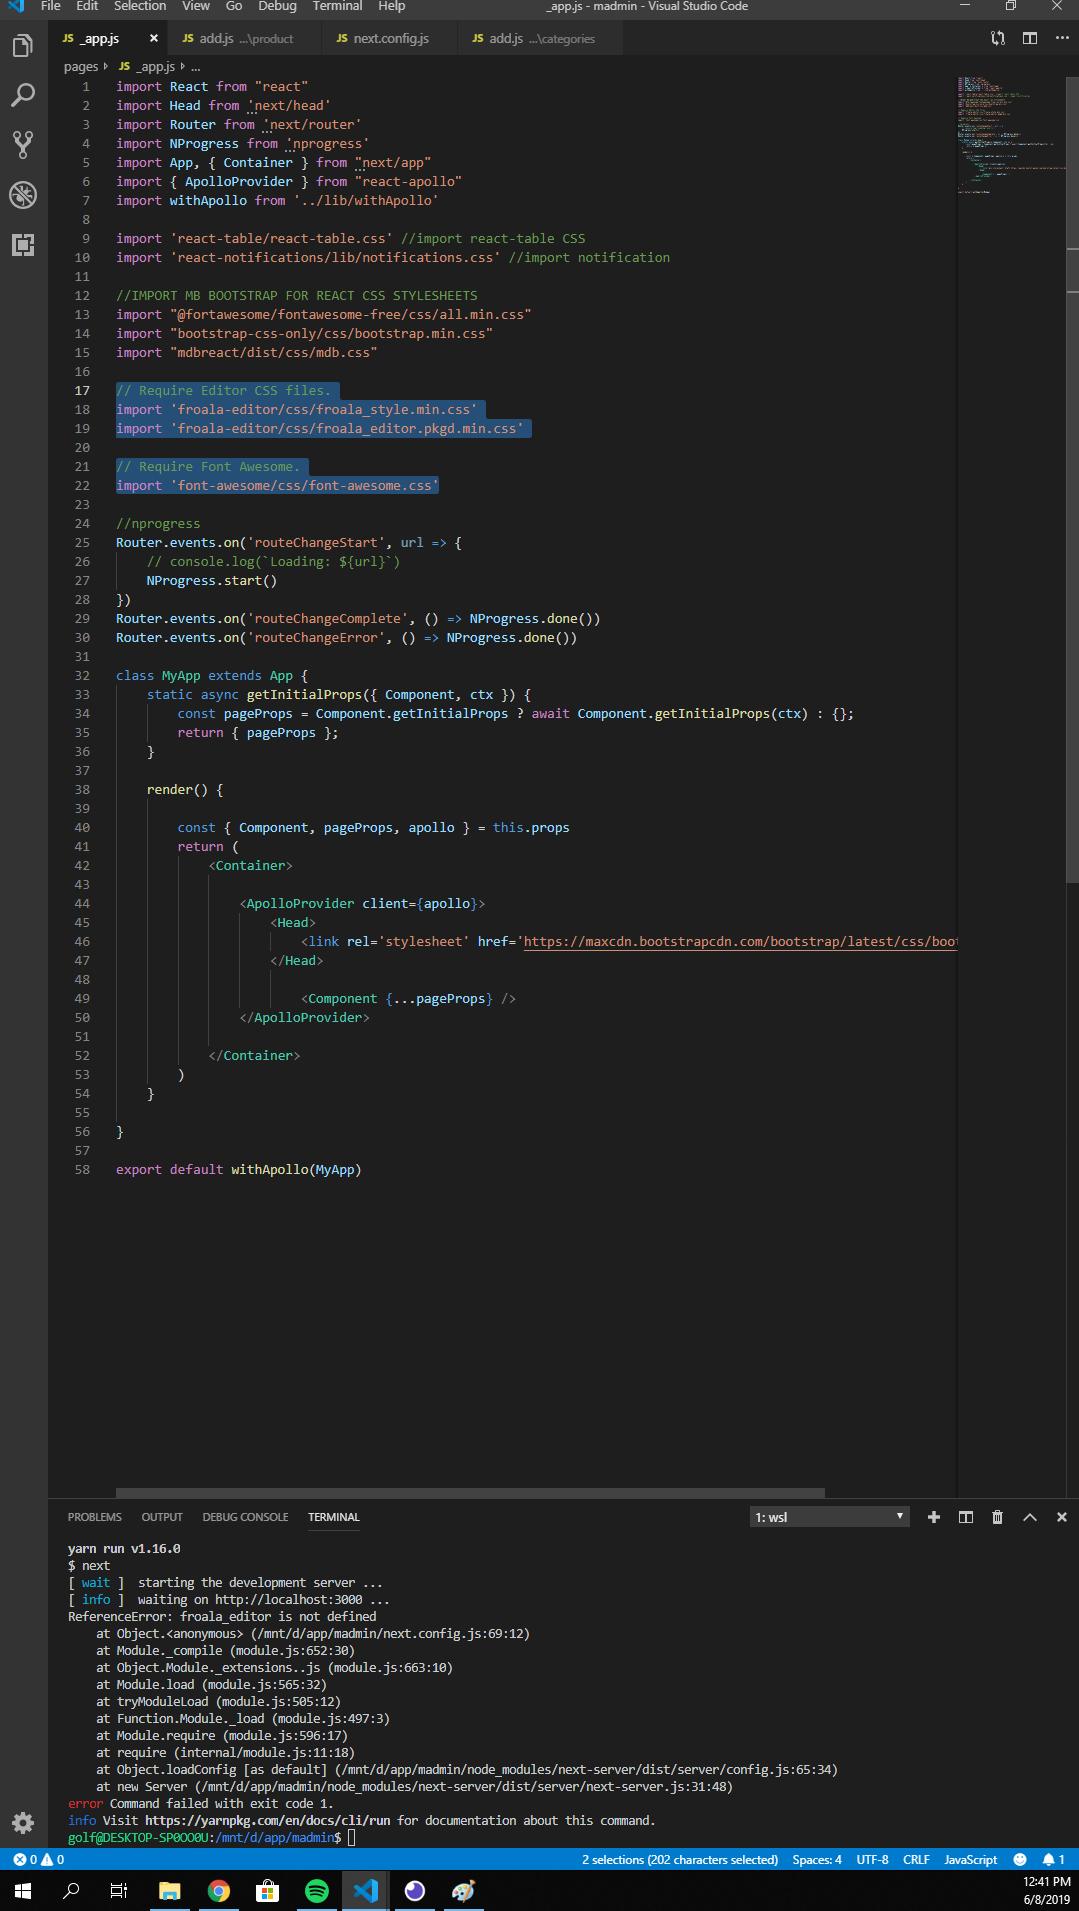 nextjs webpack 4 ] config webpack error froala_editor not defined